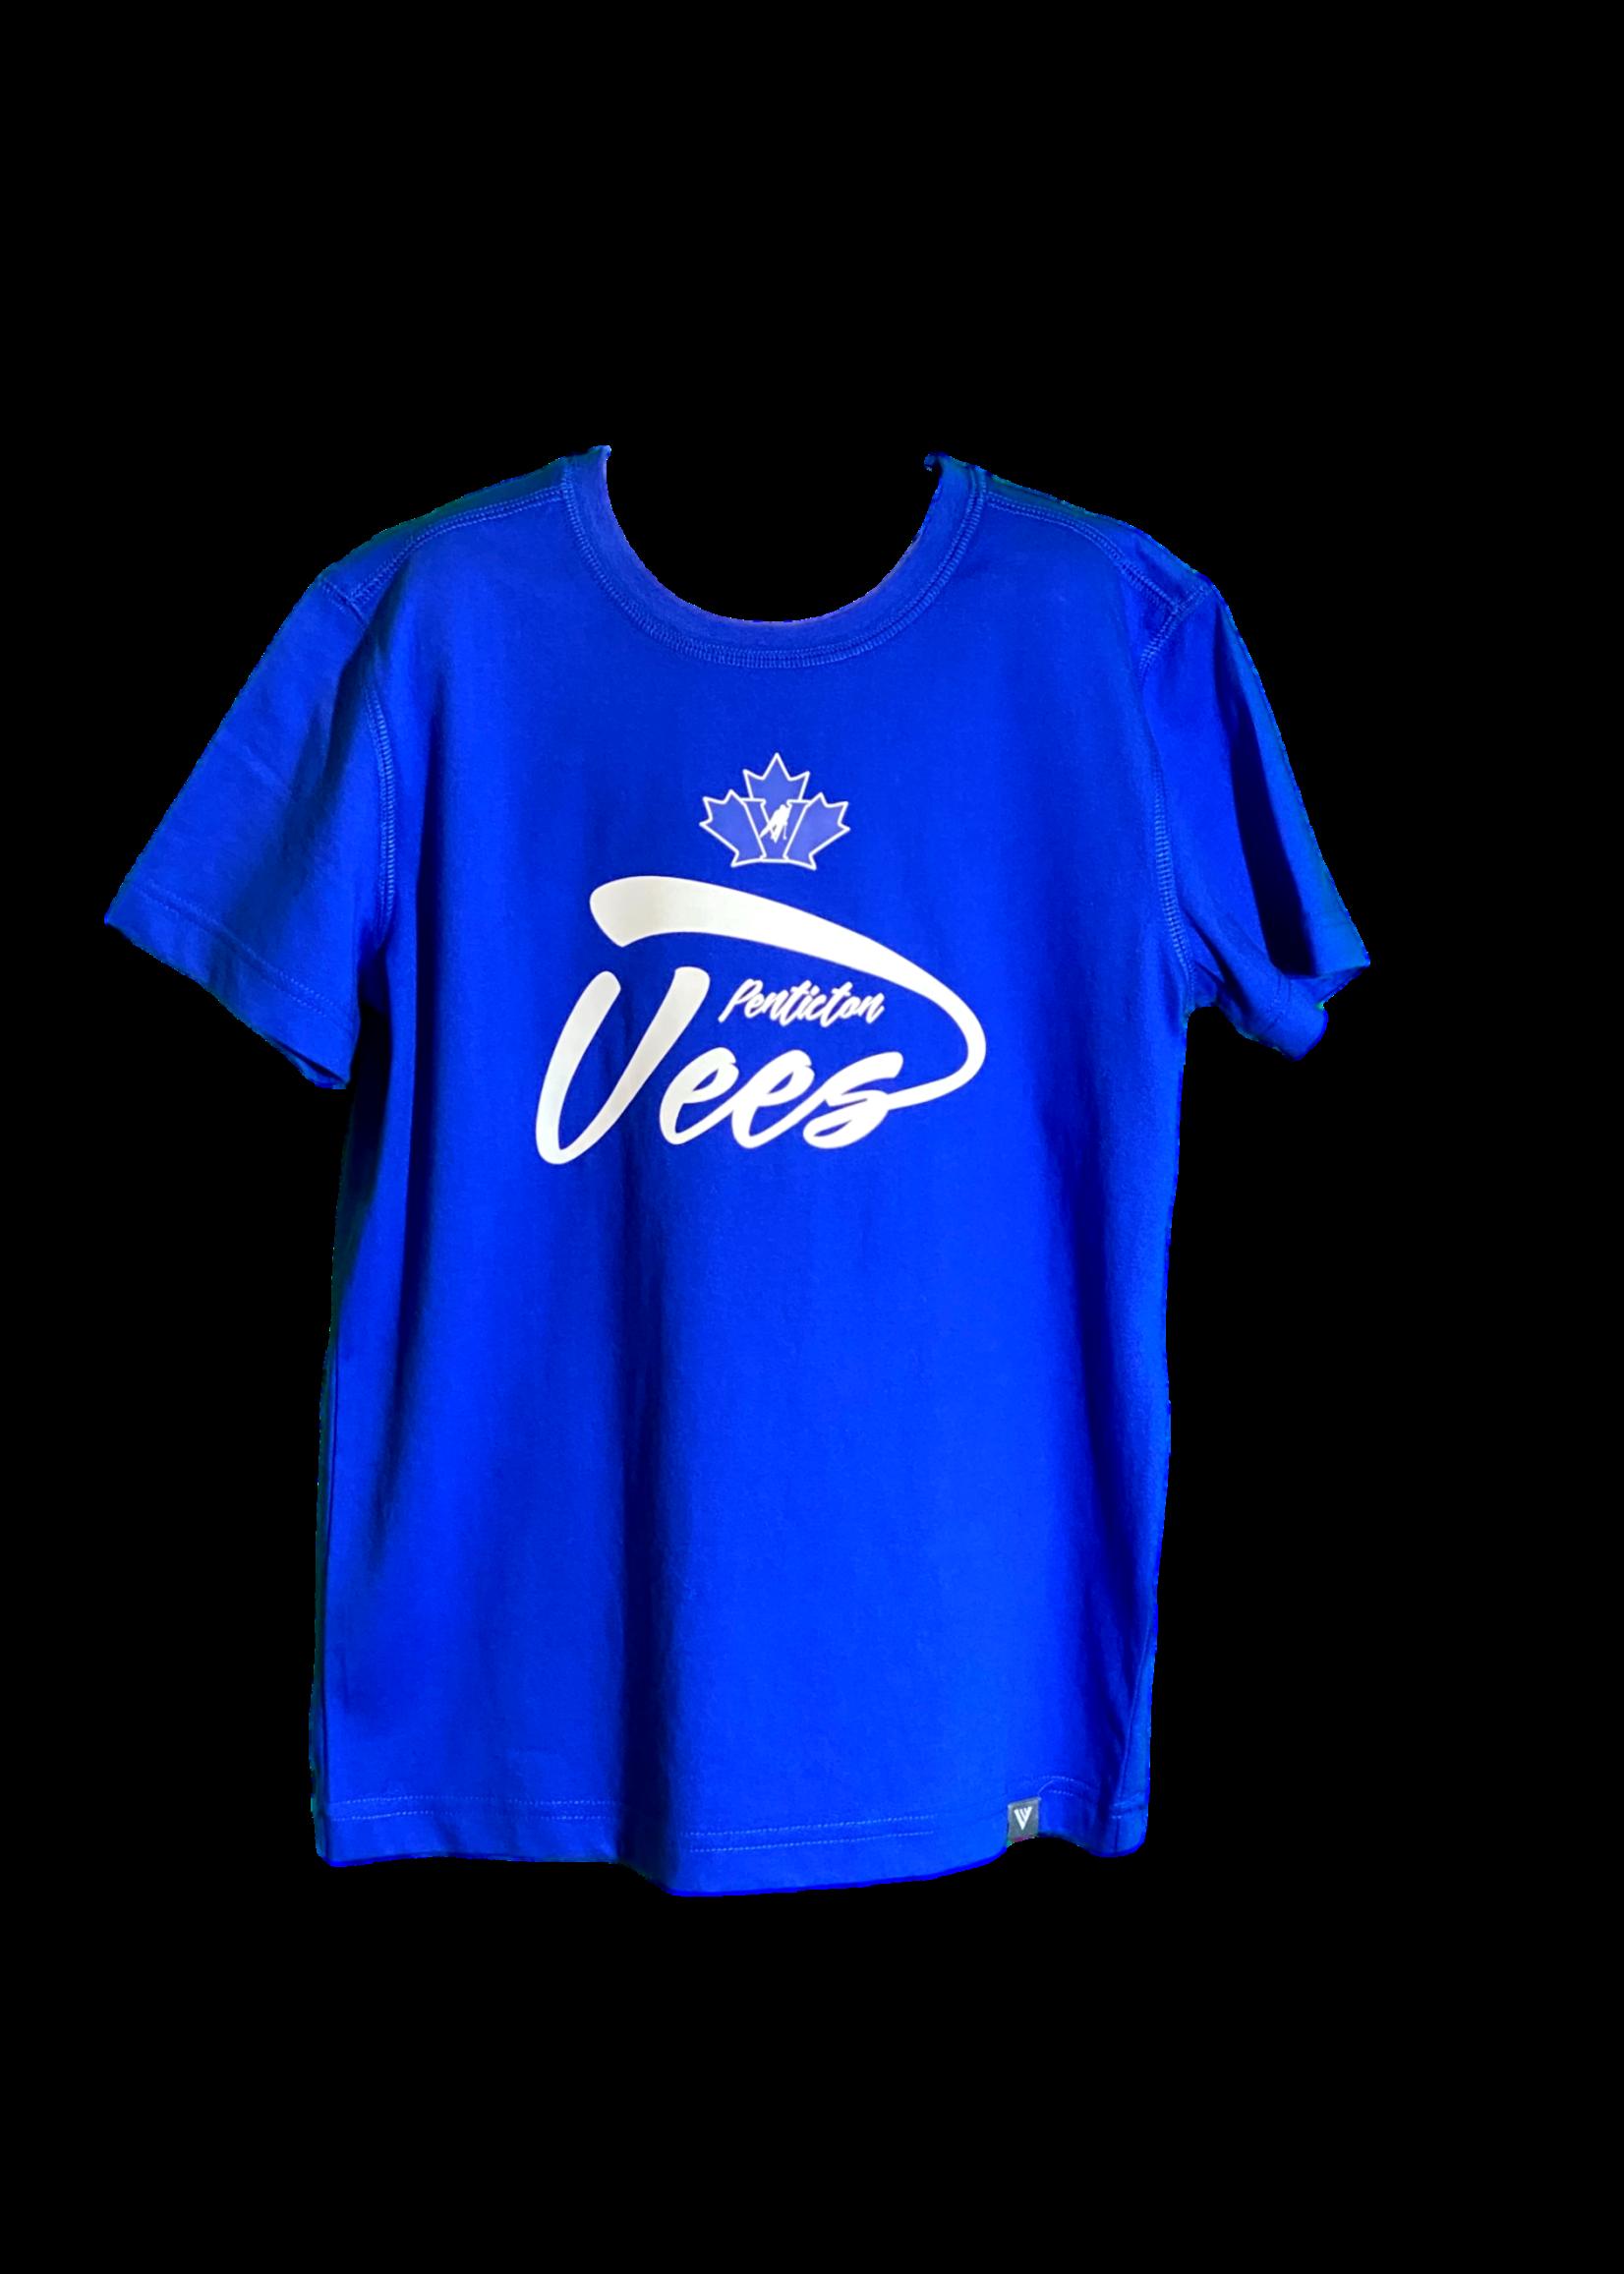 Levelwear Penticton Vees Youth Tee- Jr Principle